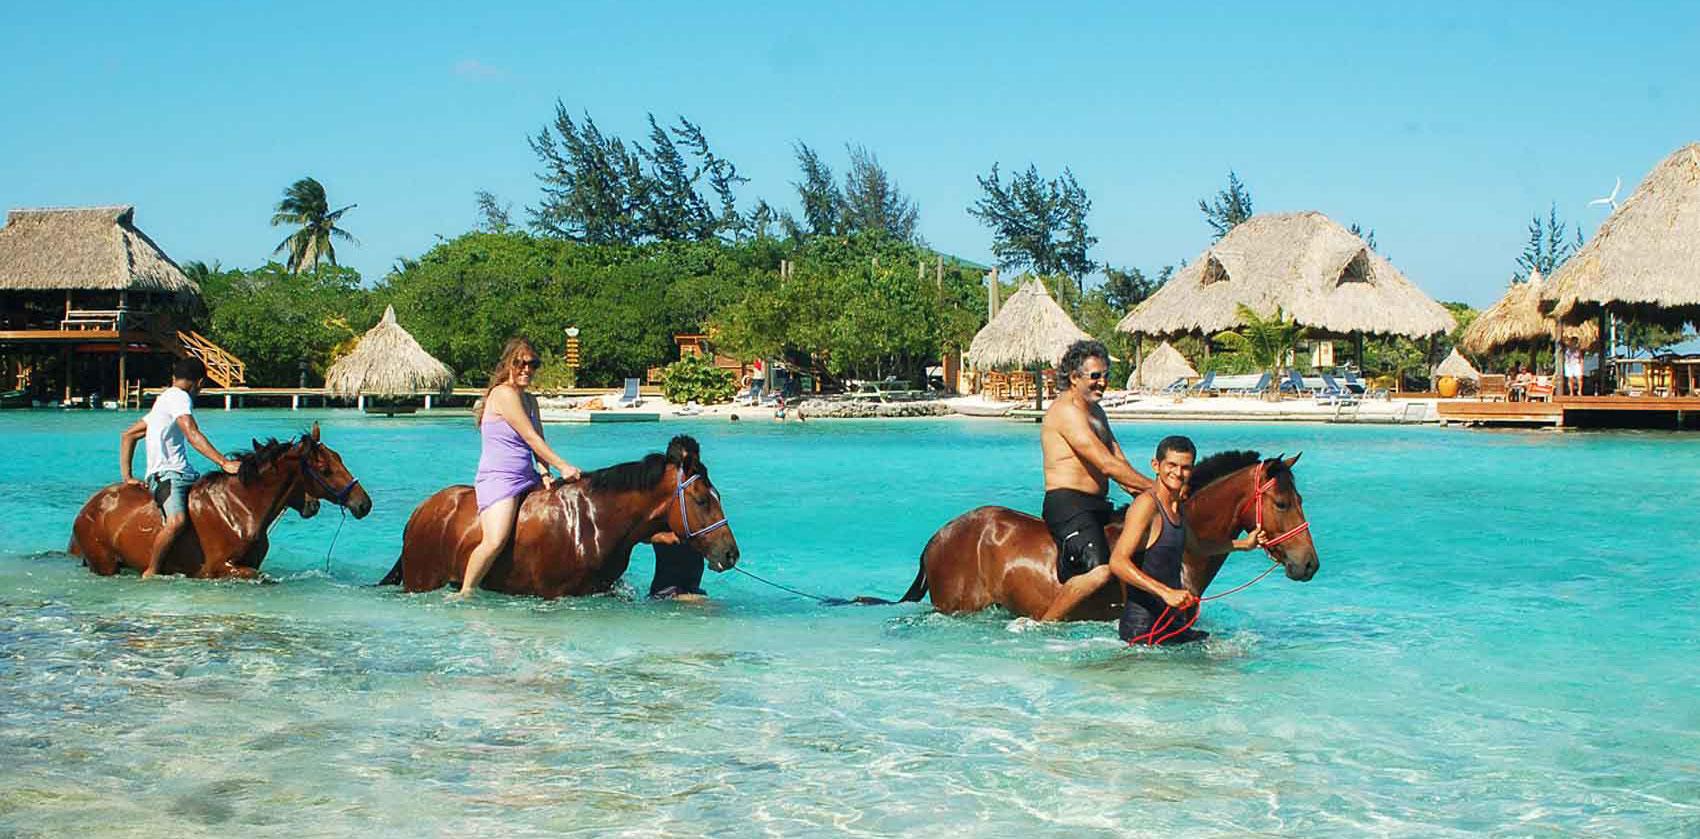 Copy of horseback-riding.jpg